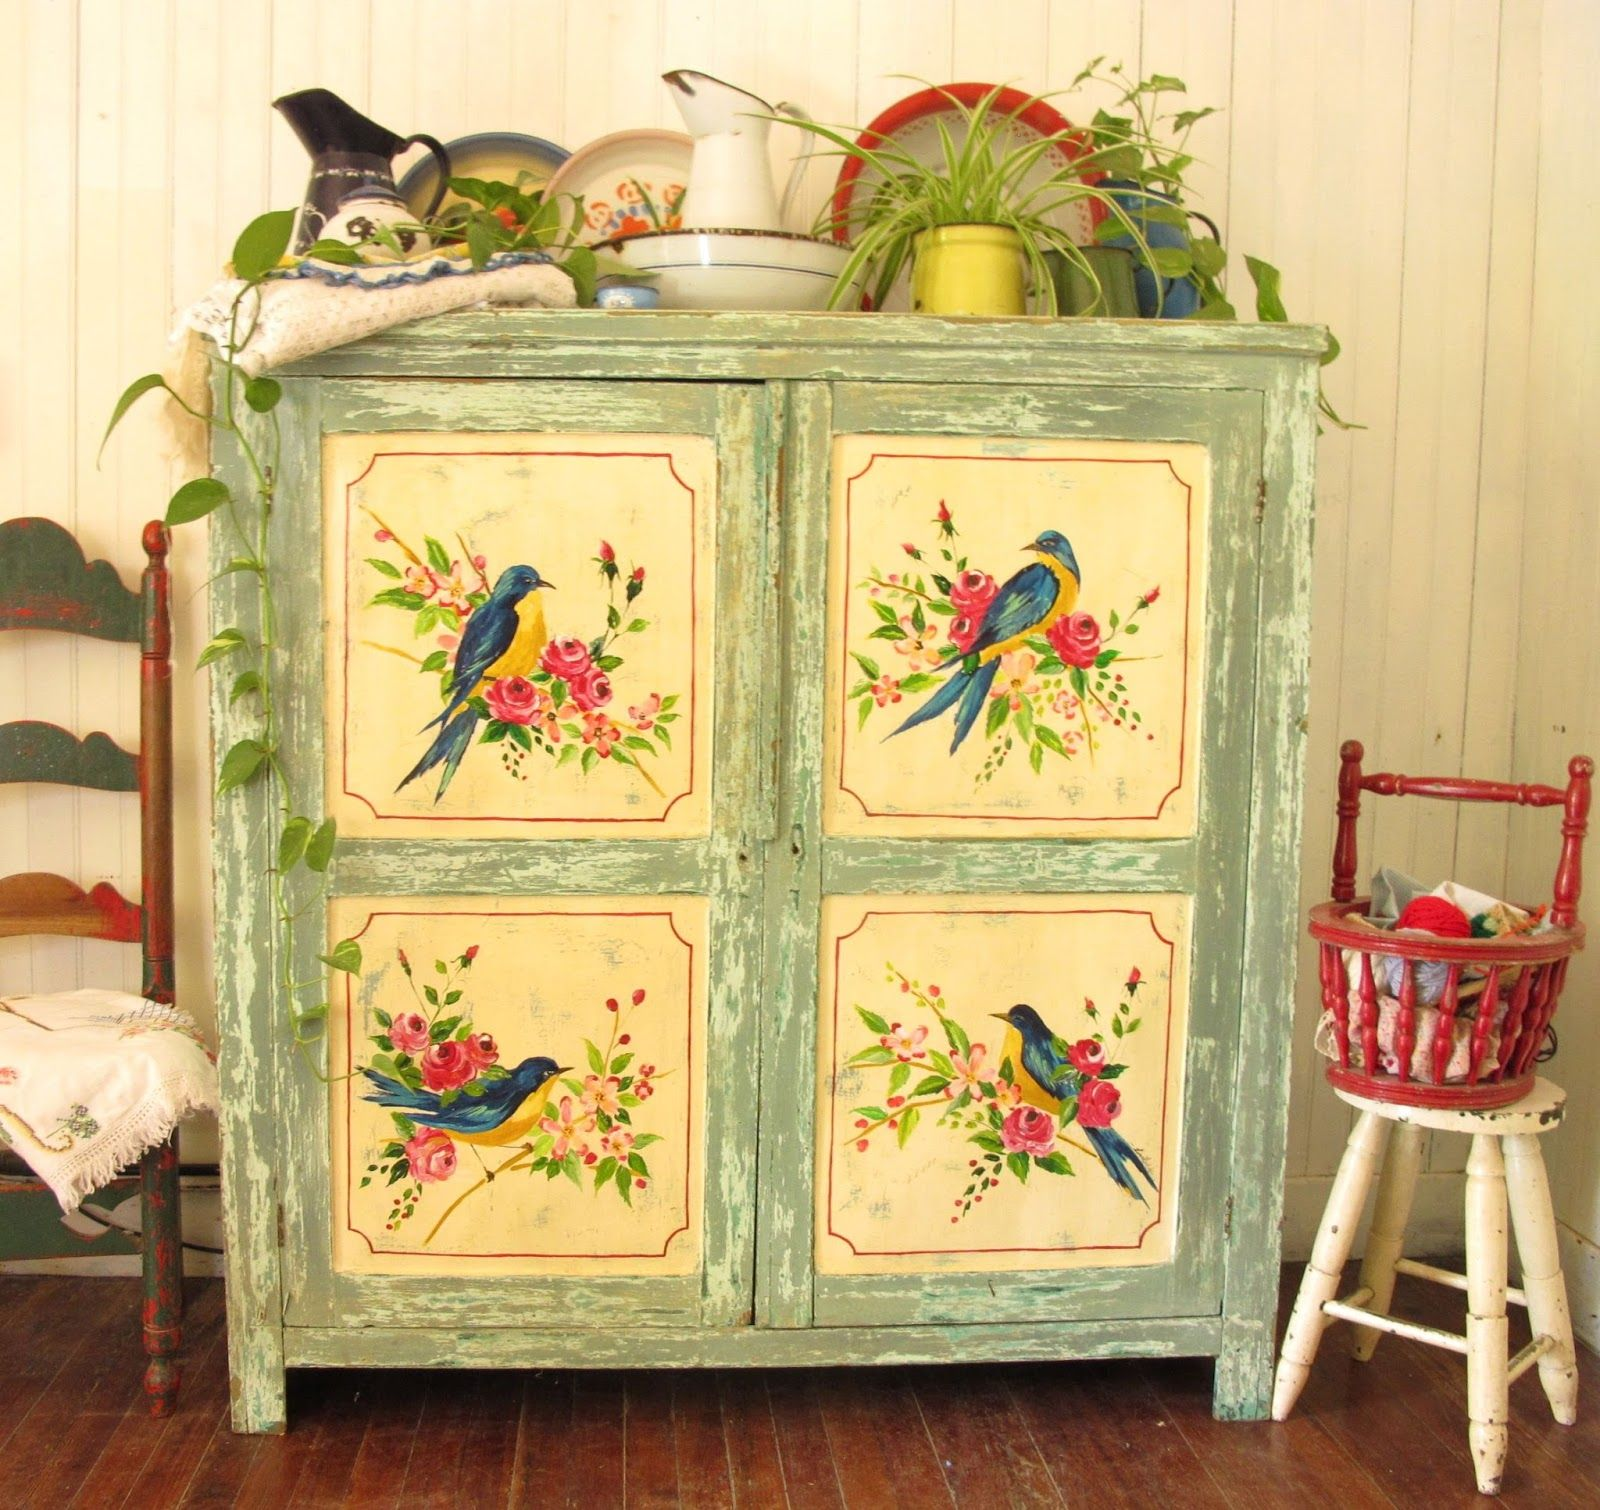 Mesita De Luz Tipo Provenzal Painting Furniturefurniture Redofurniture Ideaspastel Colorspaint